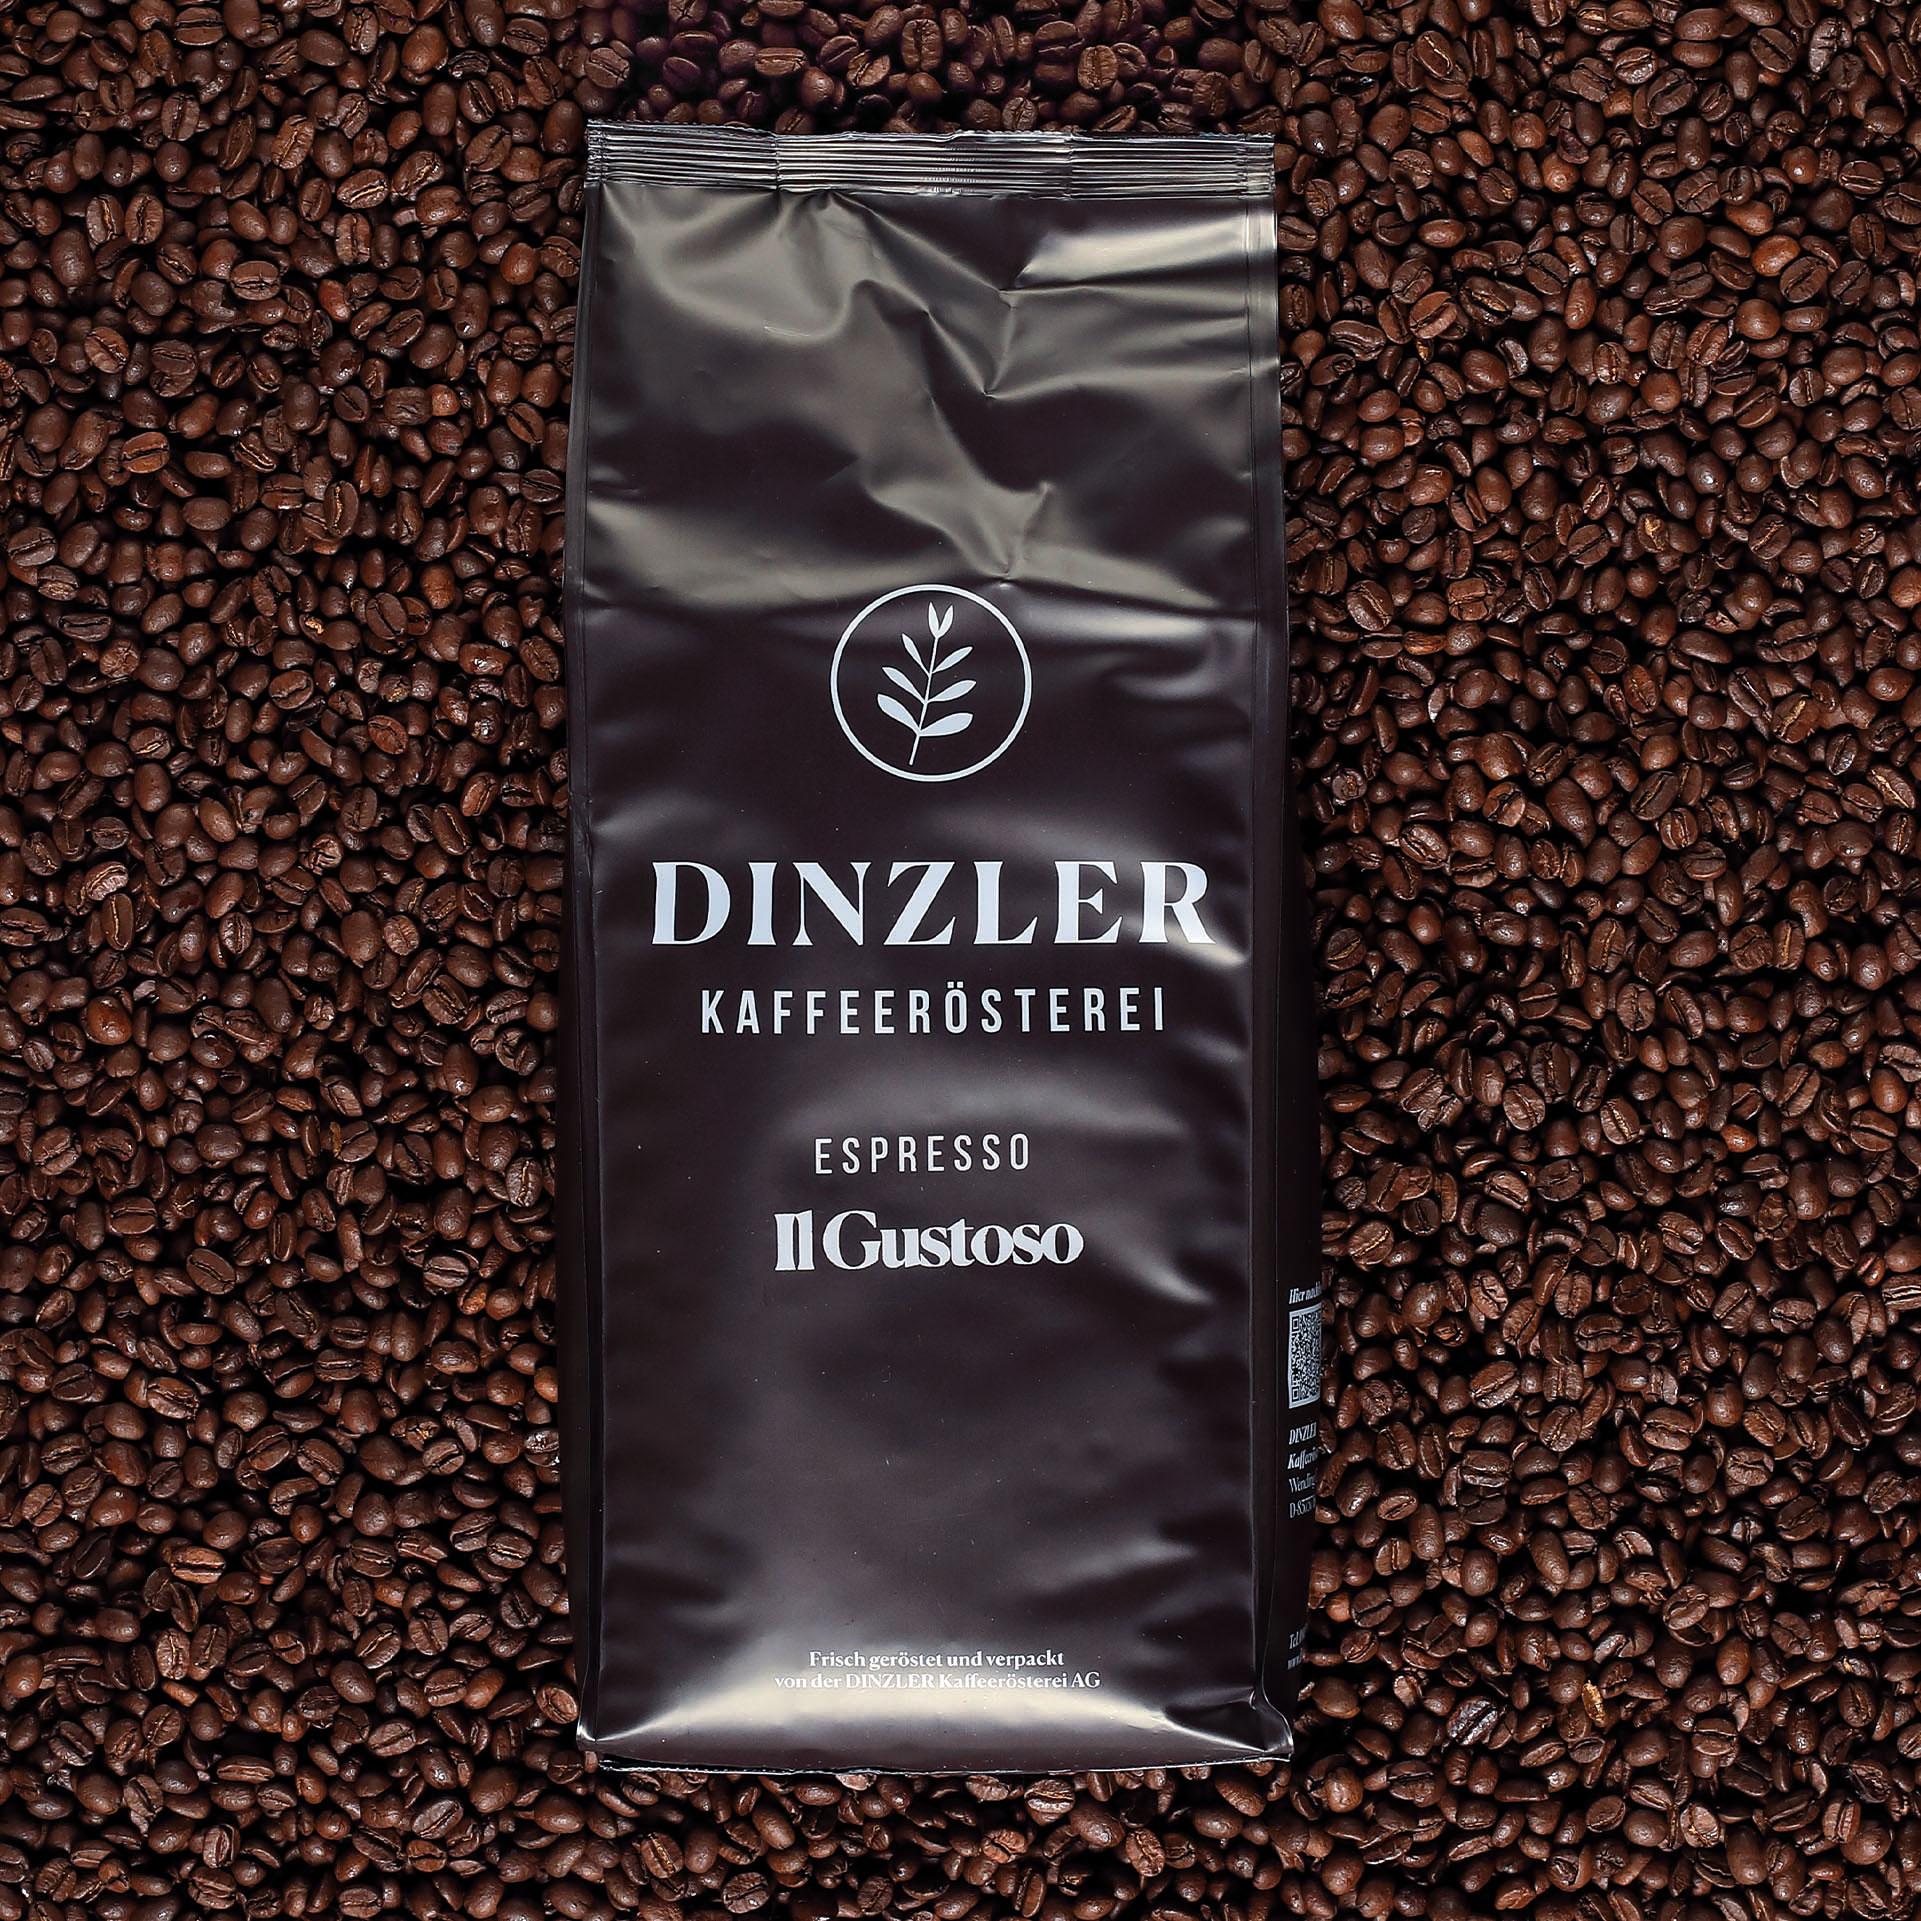 Espresso Il Gustoso | DINZLER Shop